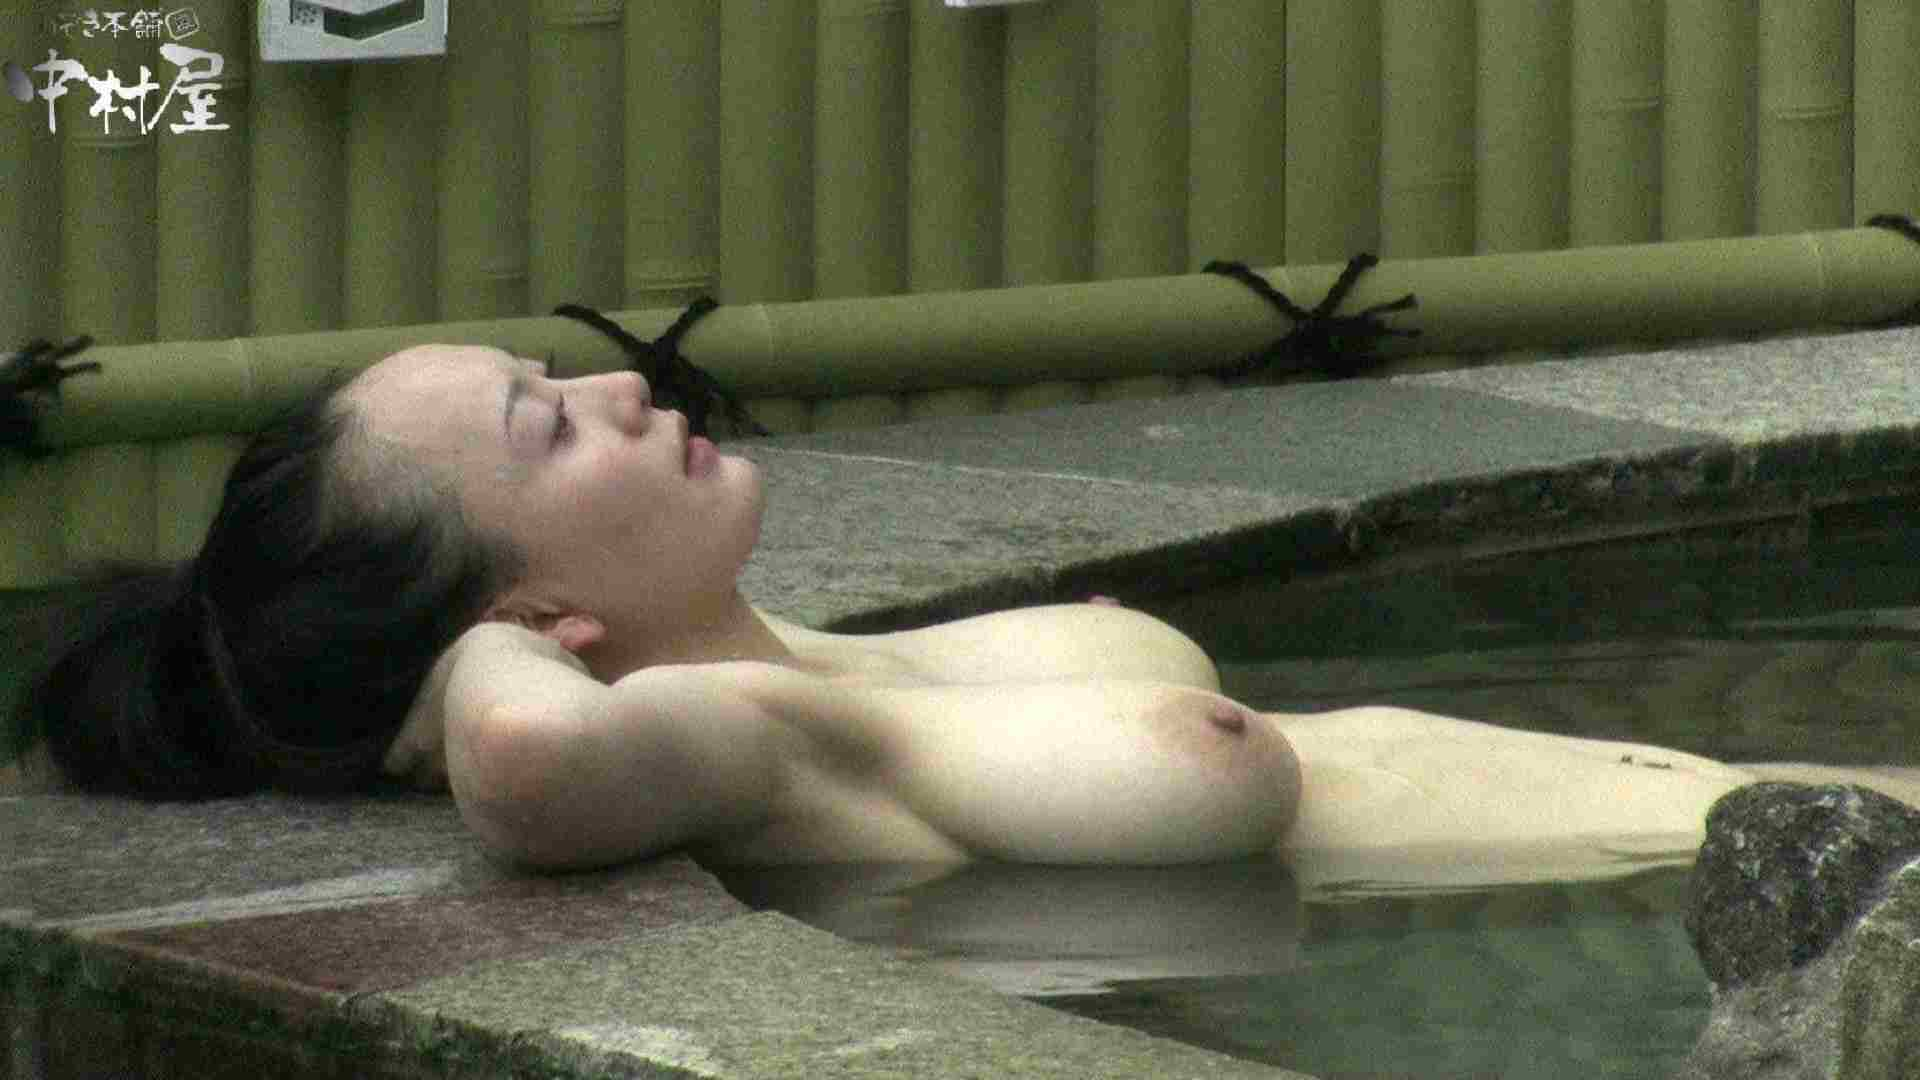 Aquaな露天風呂Vol.900 盗撮師作品 ヌード画像 86pic 83